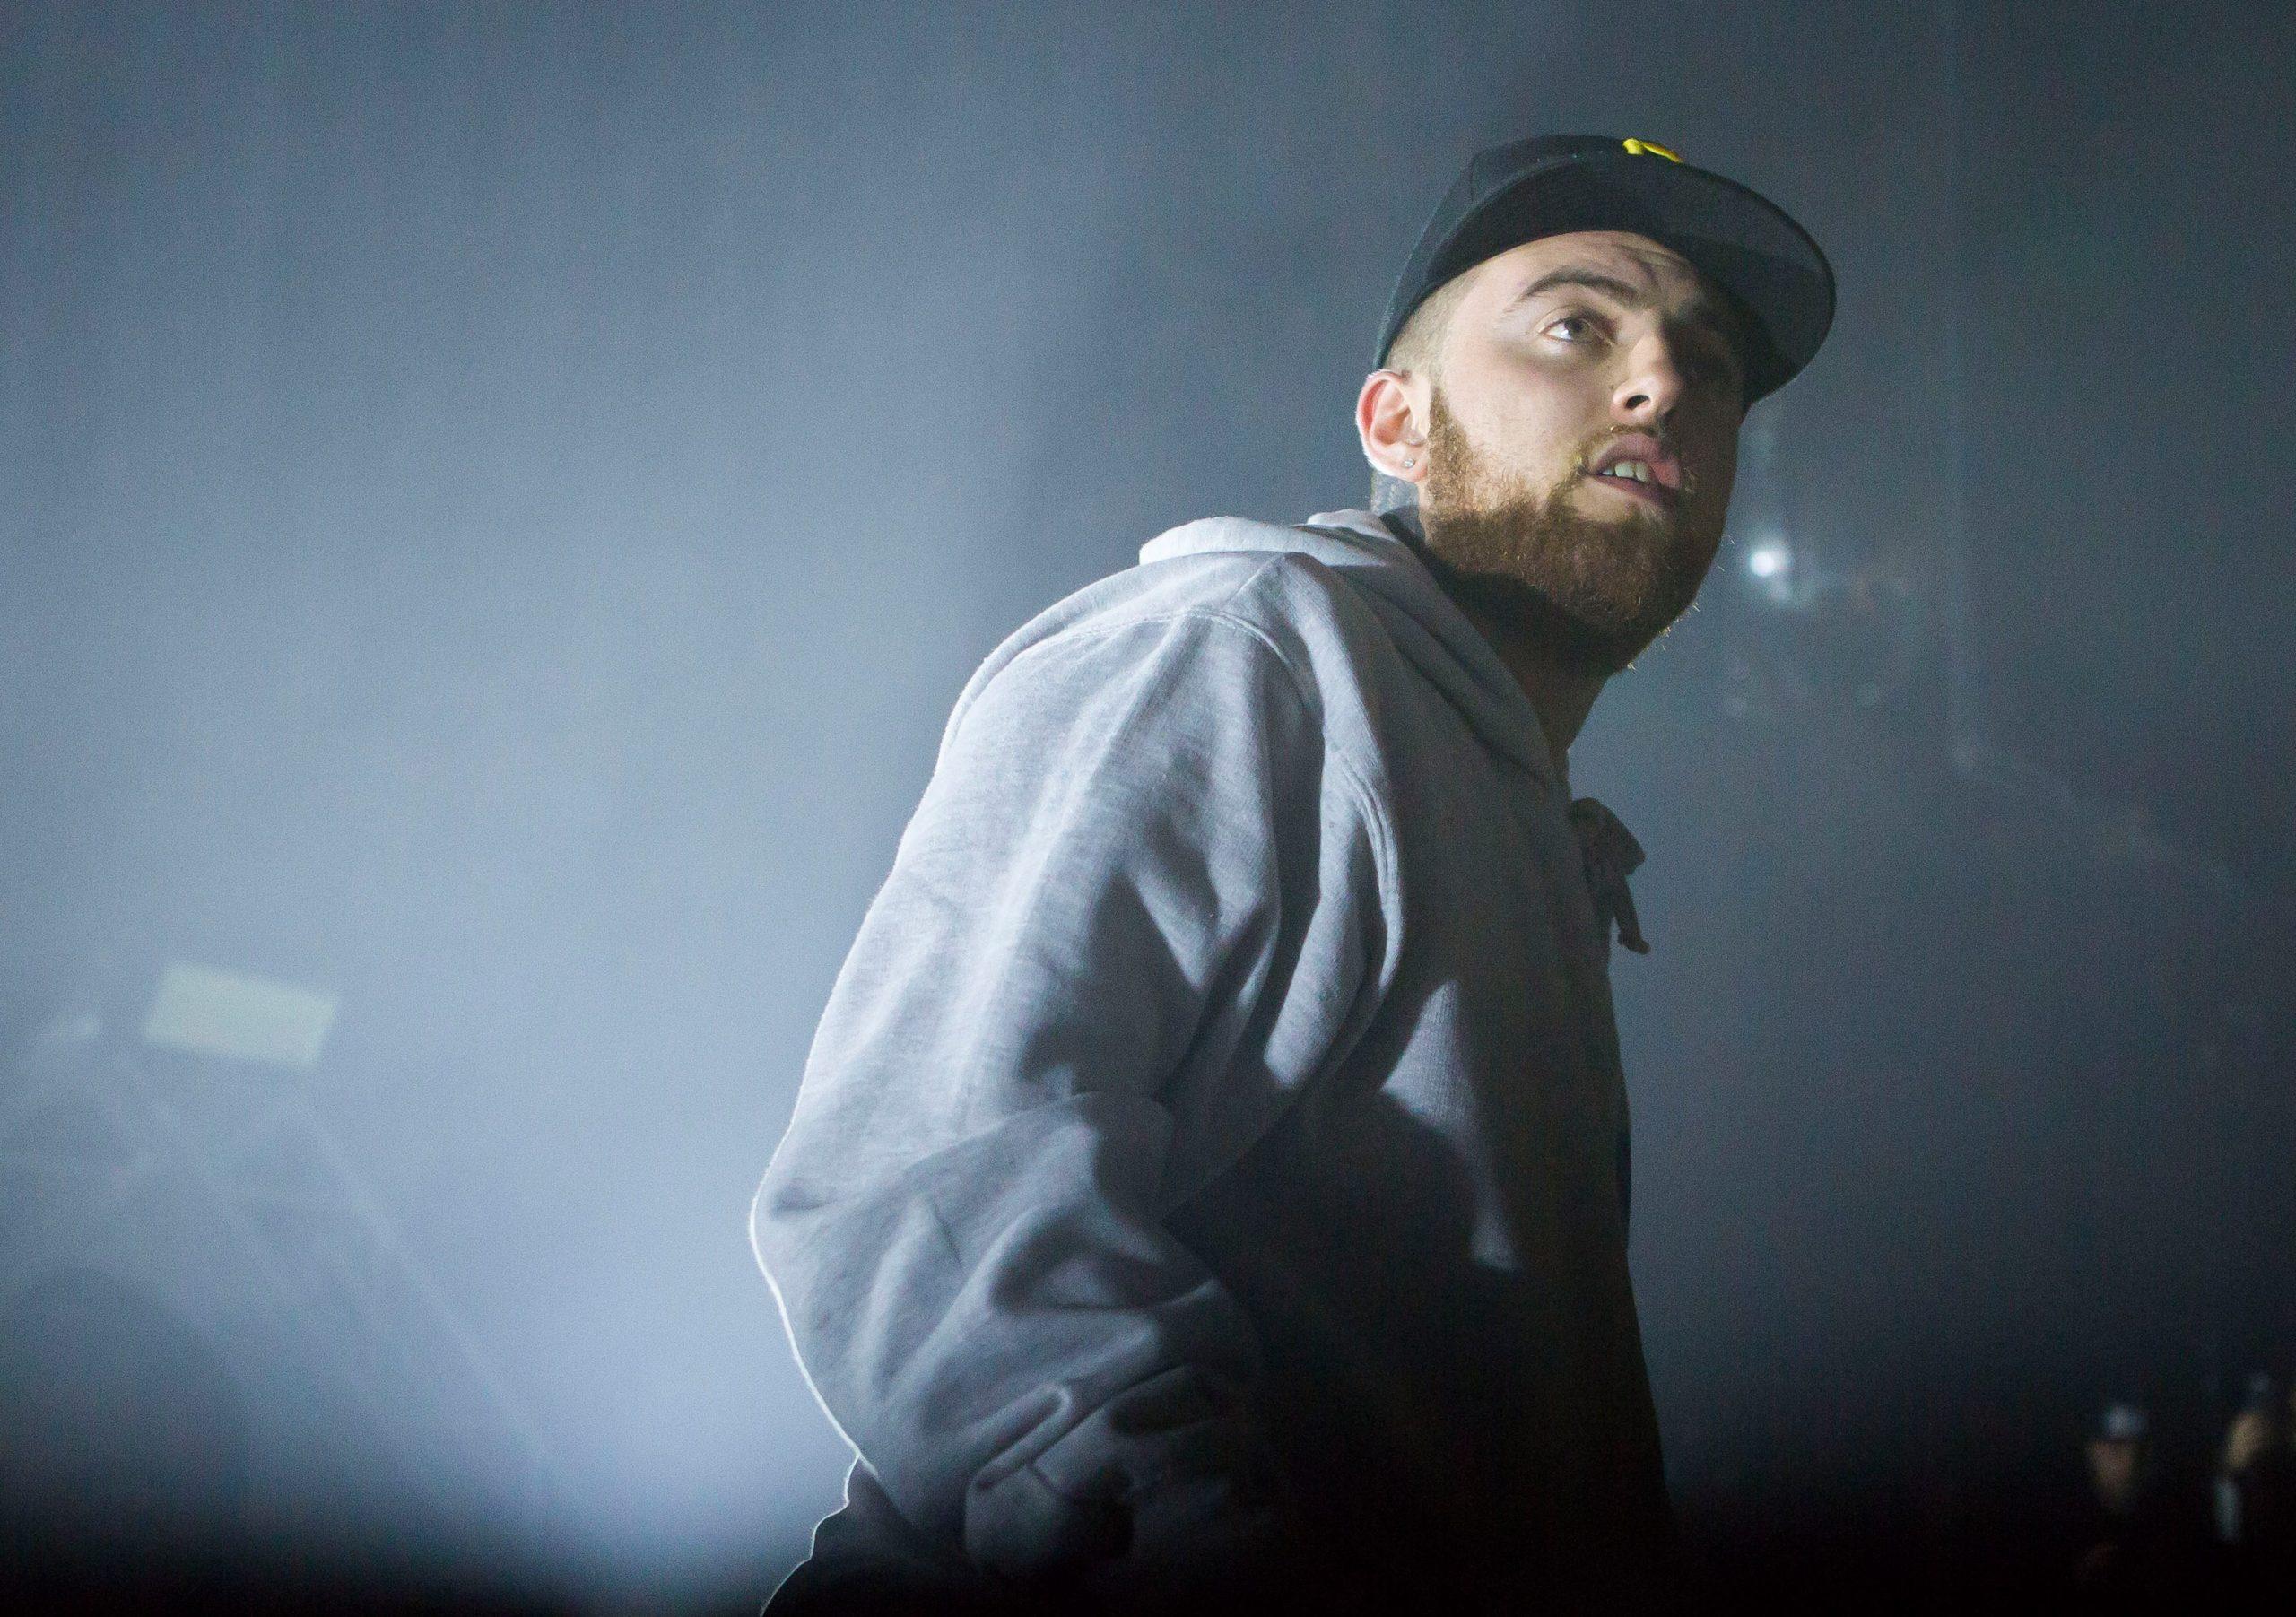 Escucha dos canciones inéditas del segundo mixtape de Mac Miller